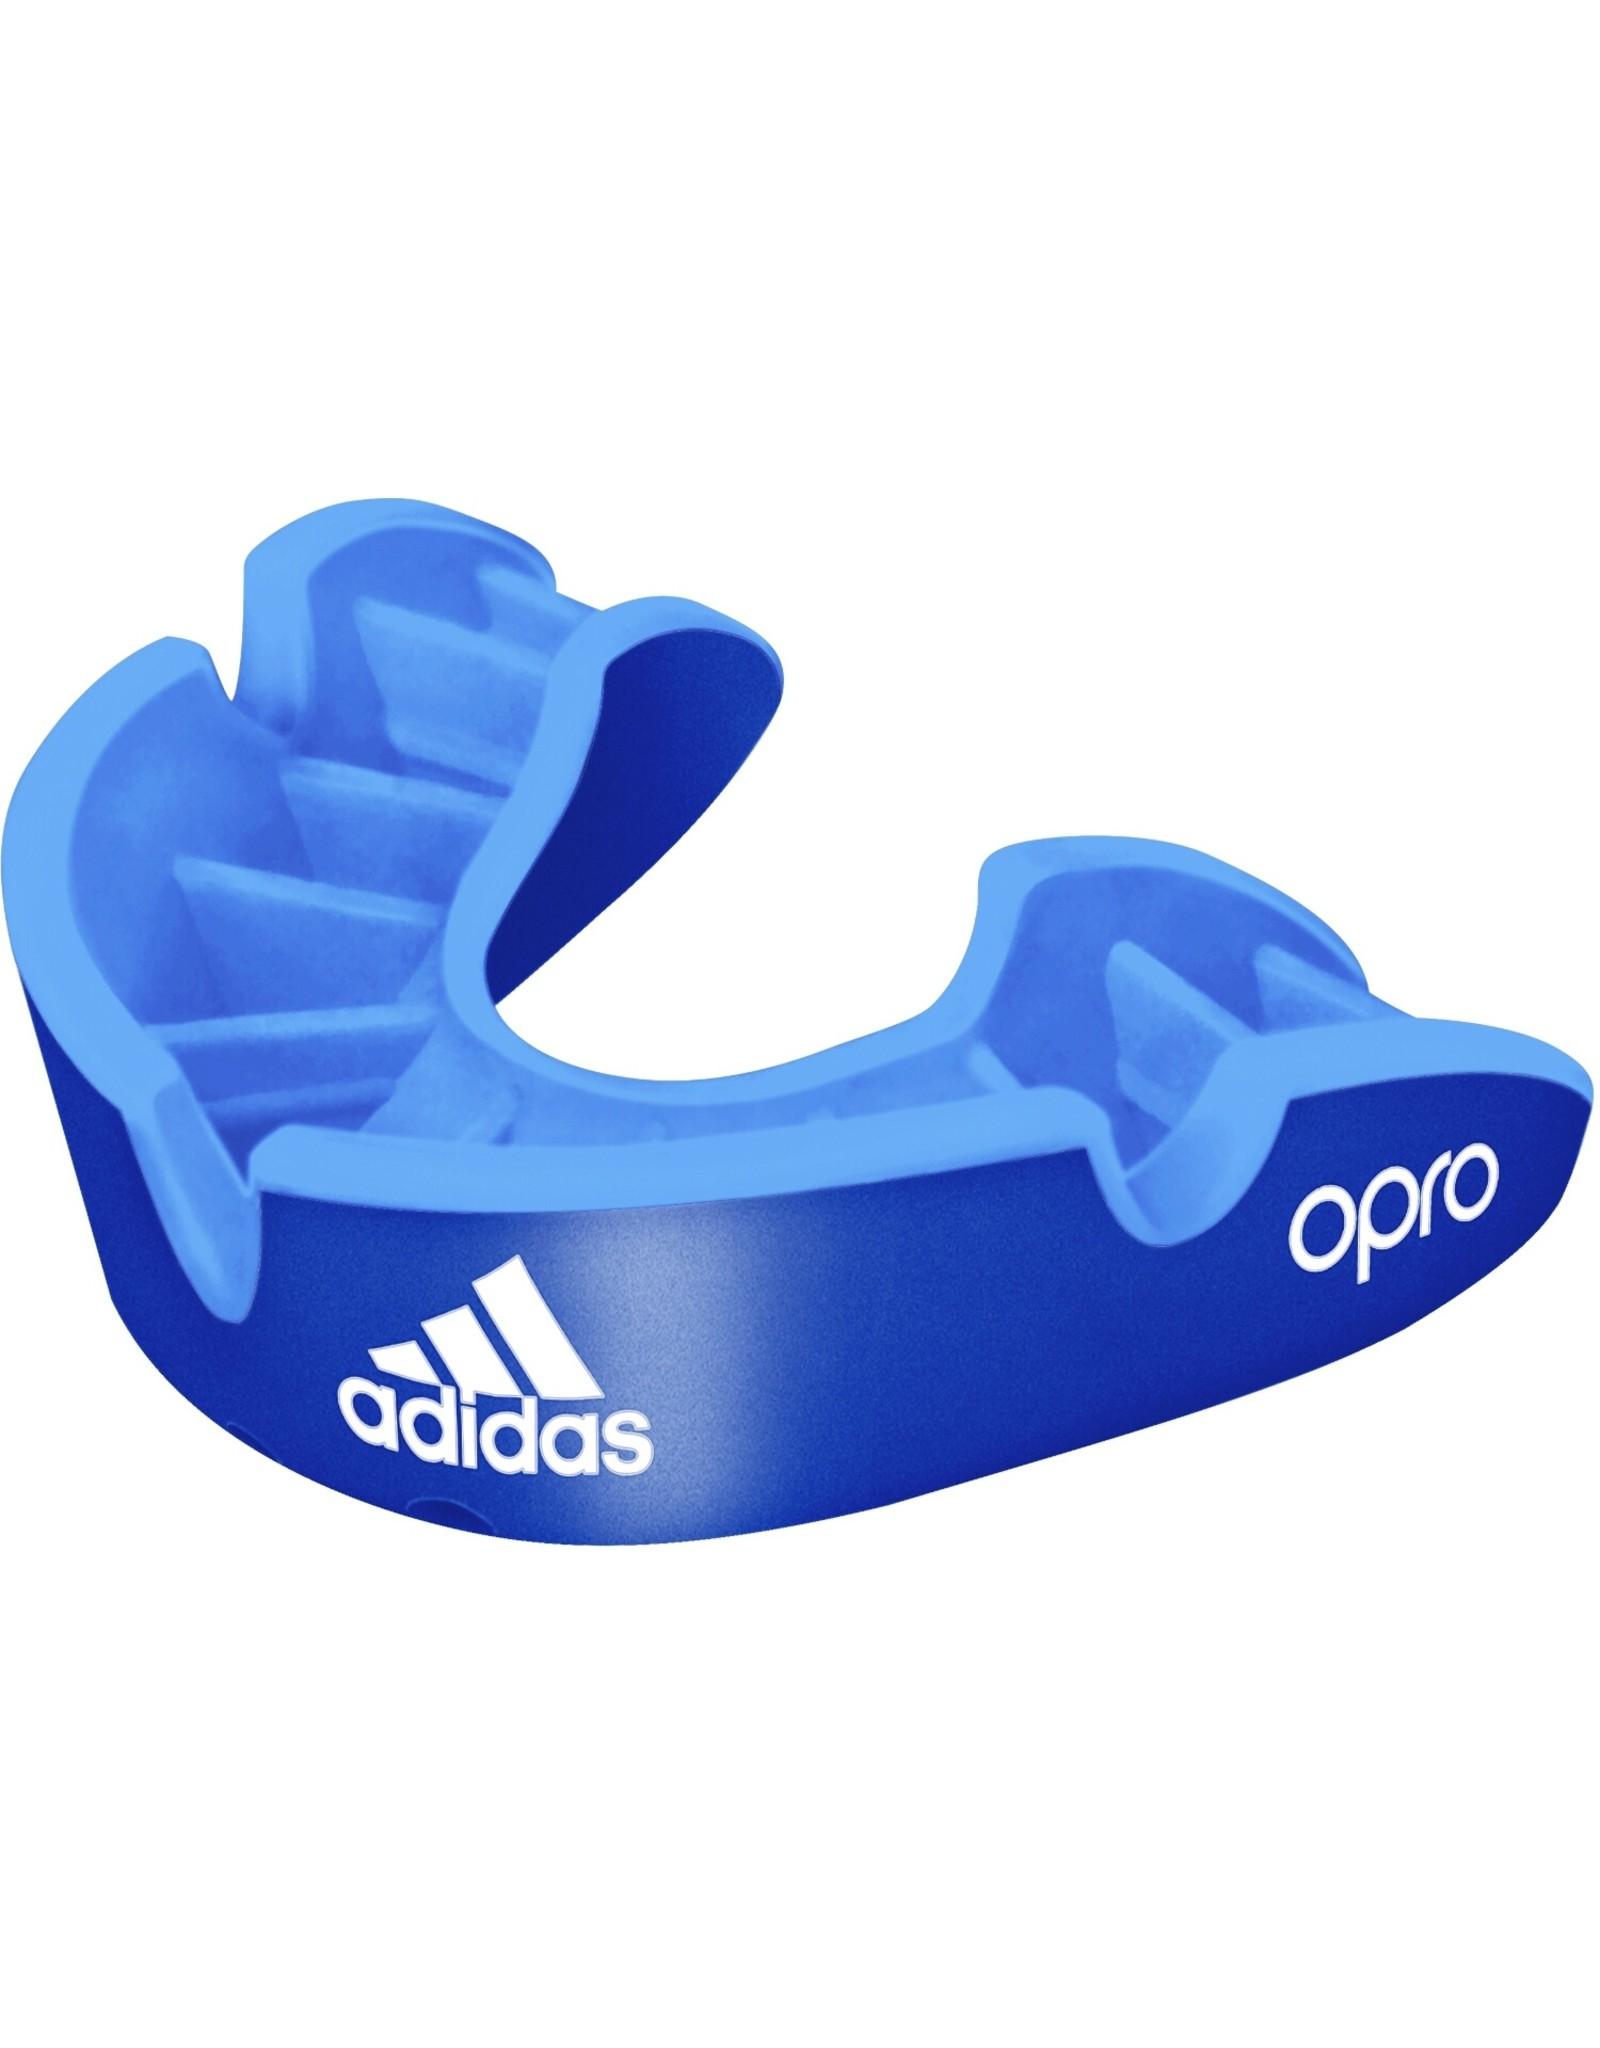 Adidas adidas OPRO Self-Fit Gen4-SENIOR-nvy